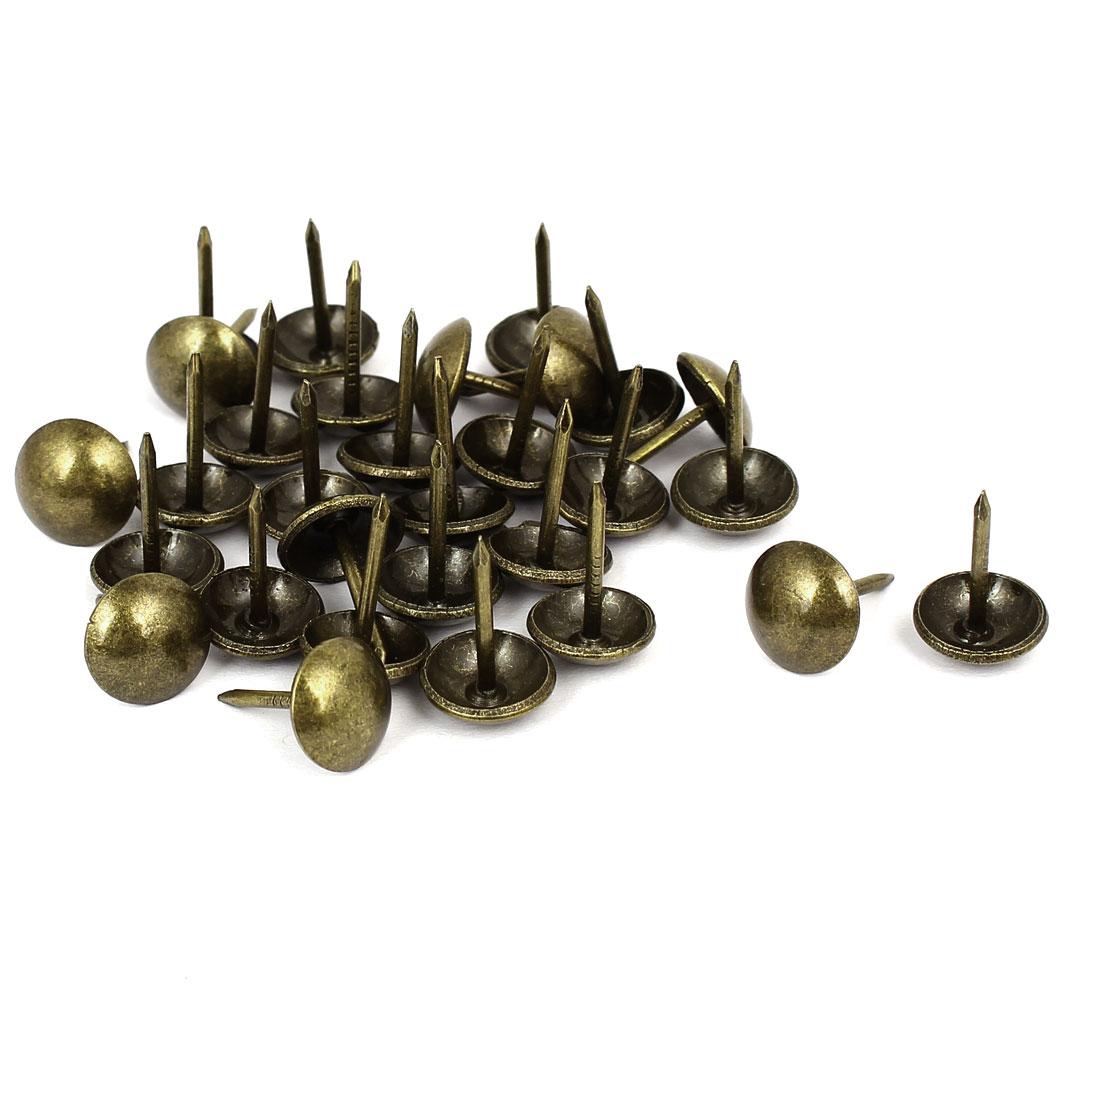 "Household Metal Domed Head Upholstery Tack Nail Bronze Tone 7/16"" Dia 30pcs"